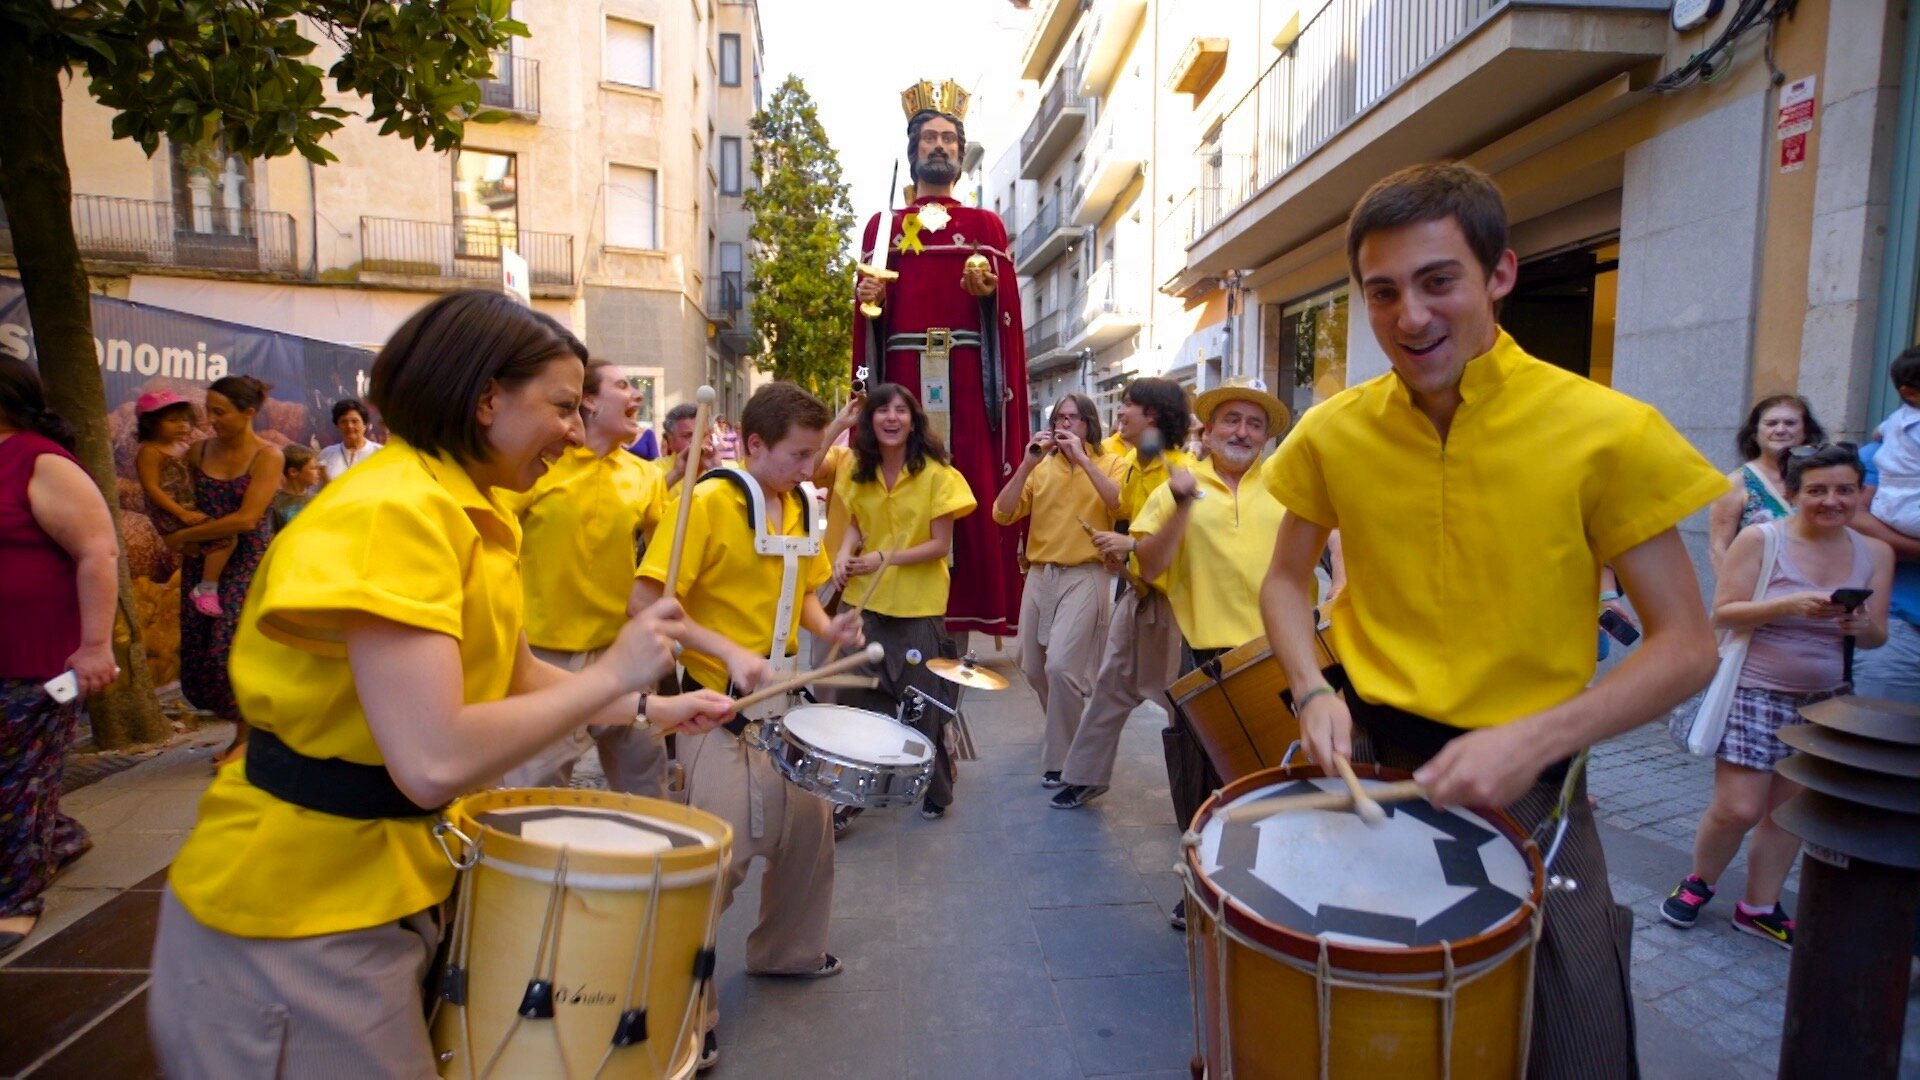 303 Girona - Mickela Mallozzi with Fal Lera Gironina in Girona, Catalonia - photo credit Bare Feet.JPG